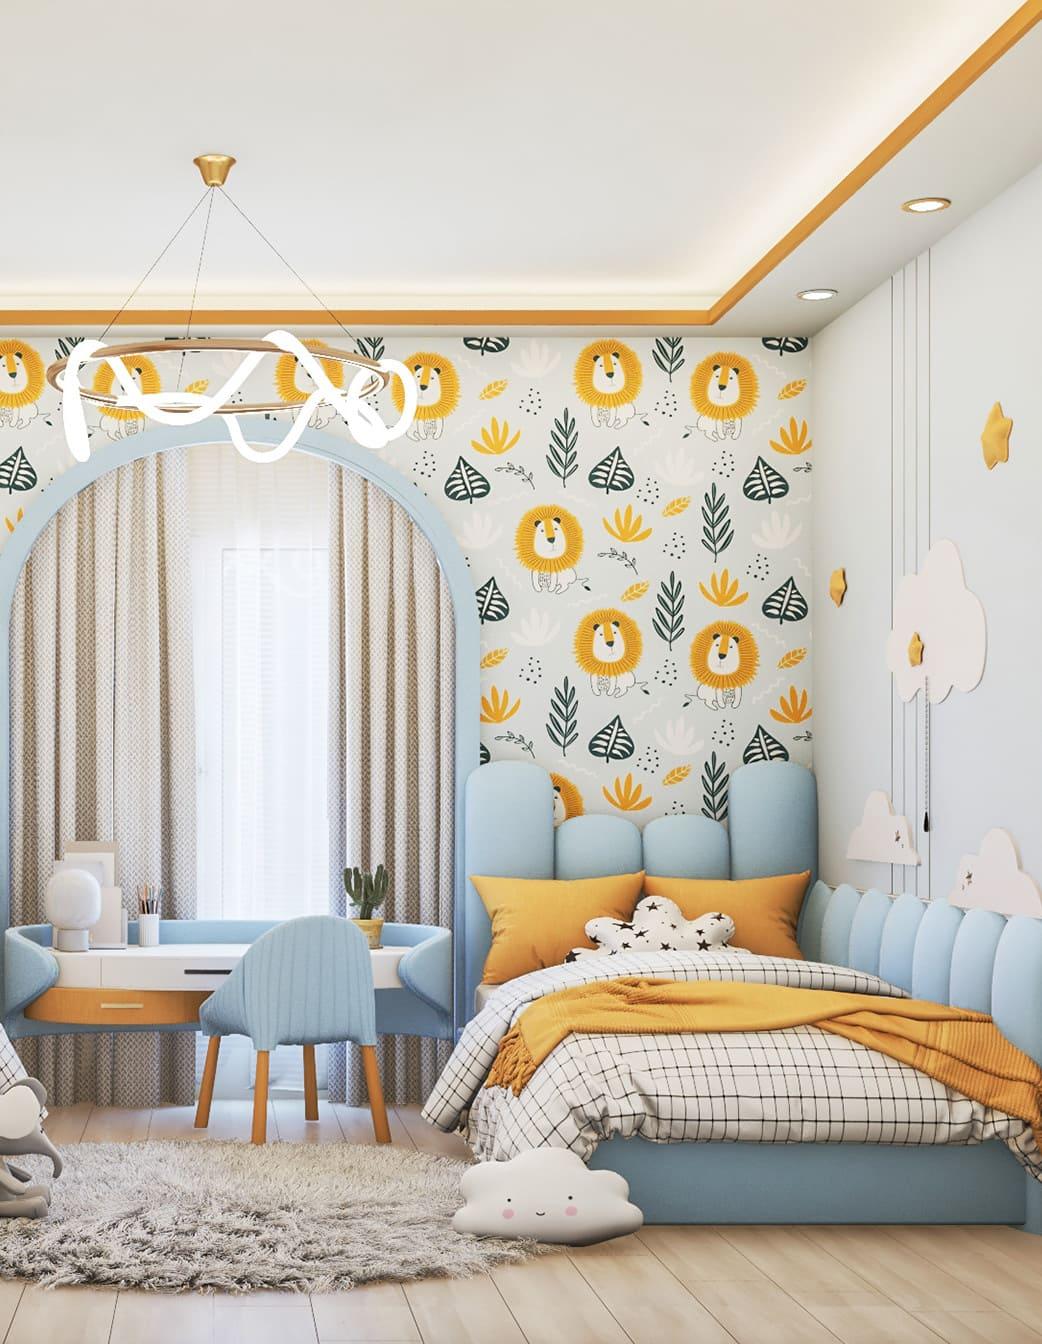 интерьер детской комнаты фото 56